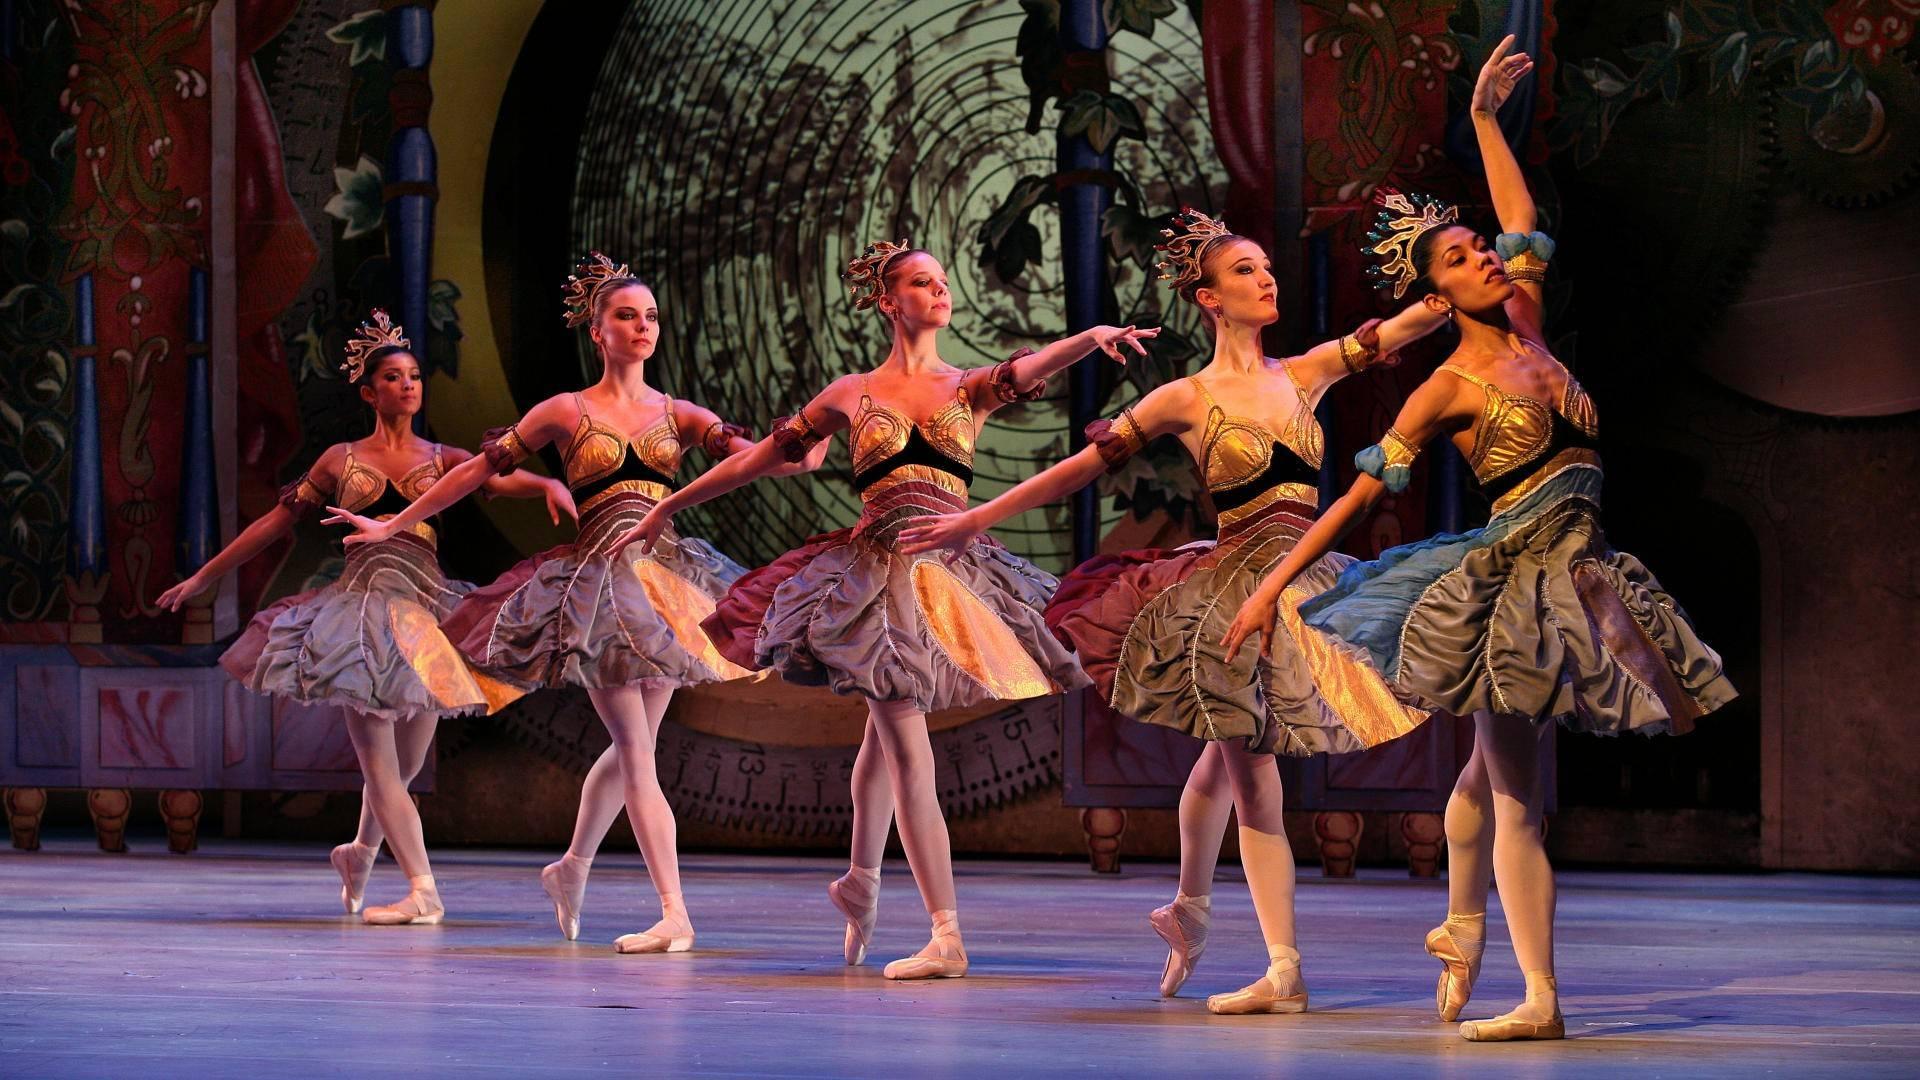 the ballerina wallpaper - photo #18